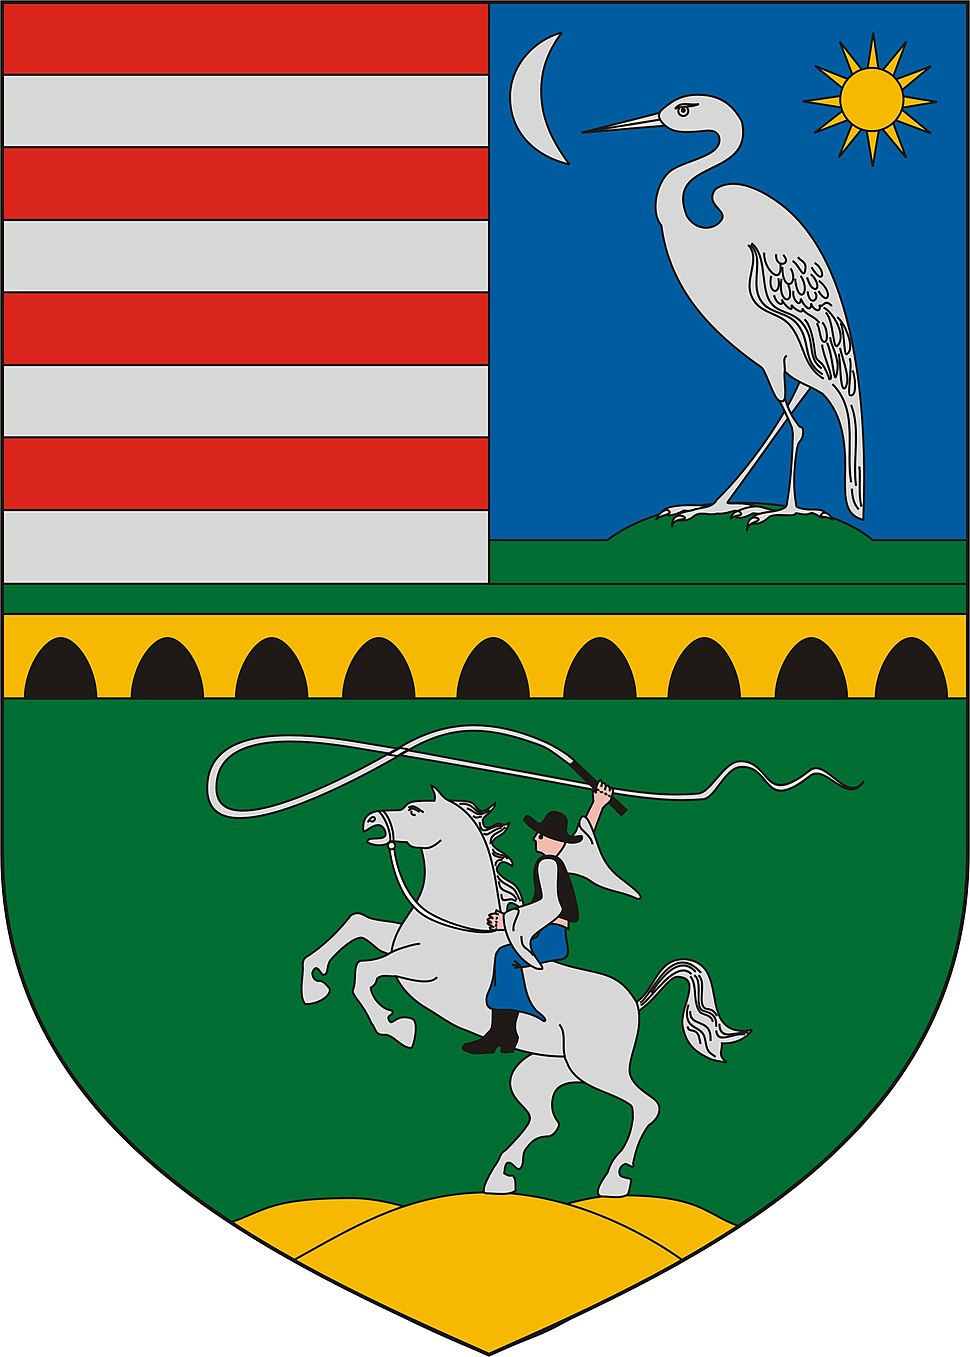 Coat of arms of Hortobágy